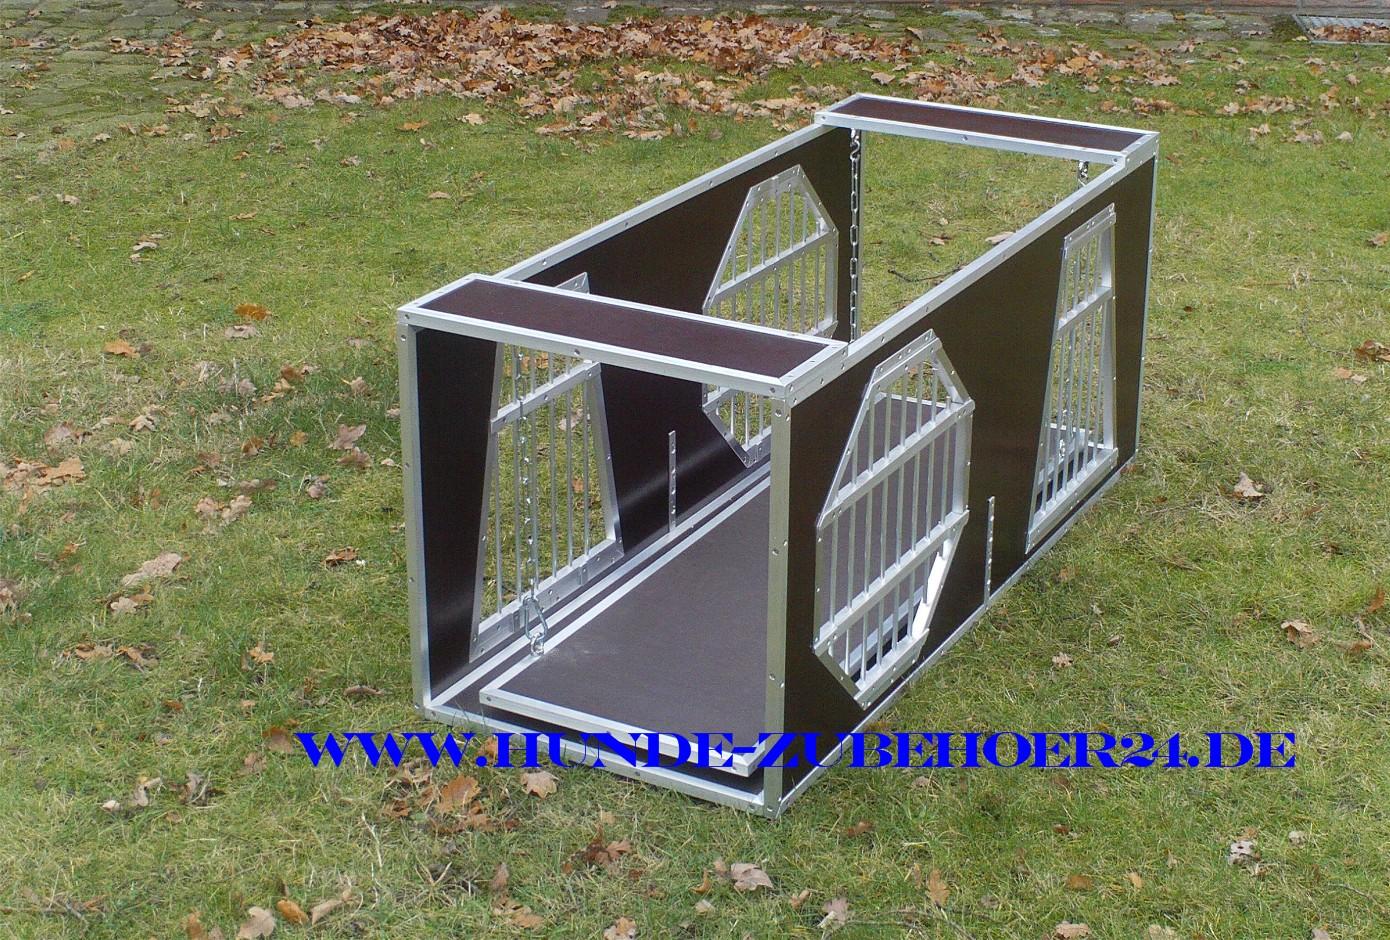 www hunde wurfkiste mit welpenauslauf. Black Bedroom Furniture Sets. Home Design Ideas